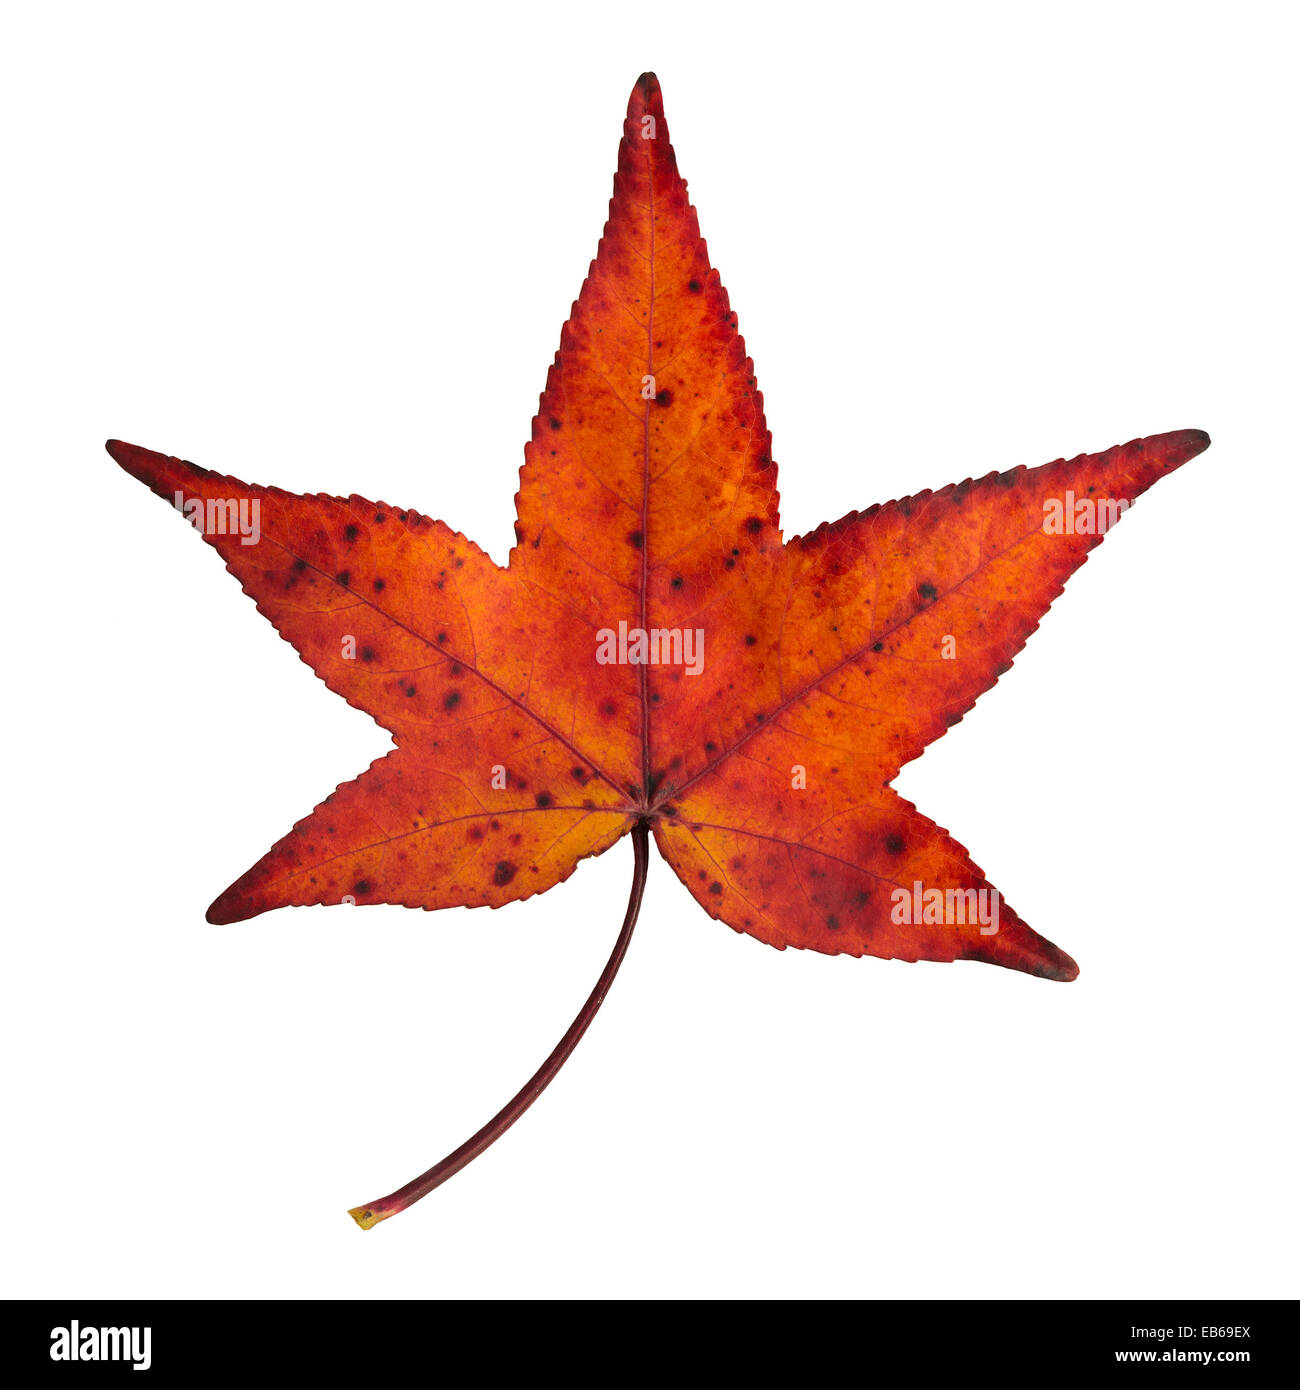 autumn red and orange maple leaf isolated - Stock Image